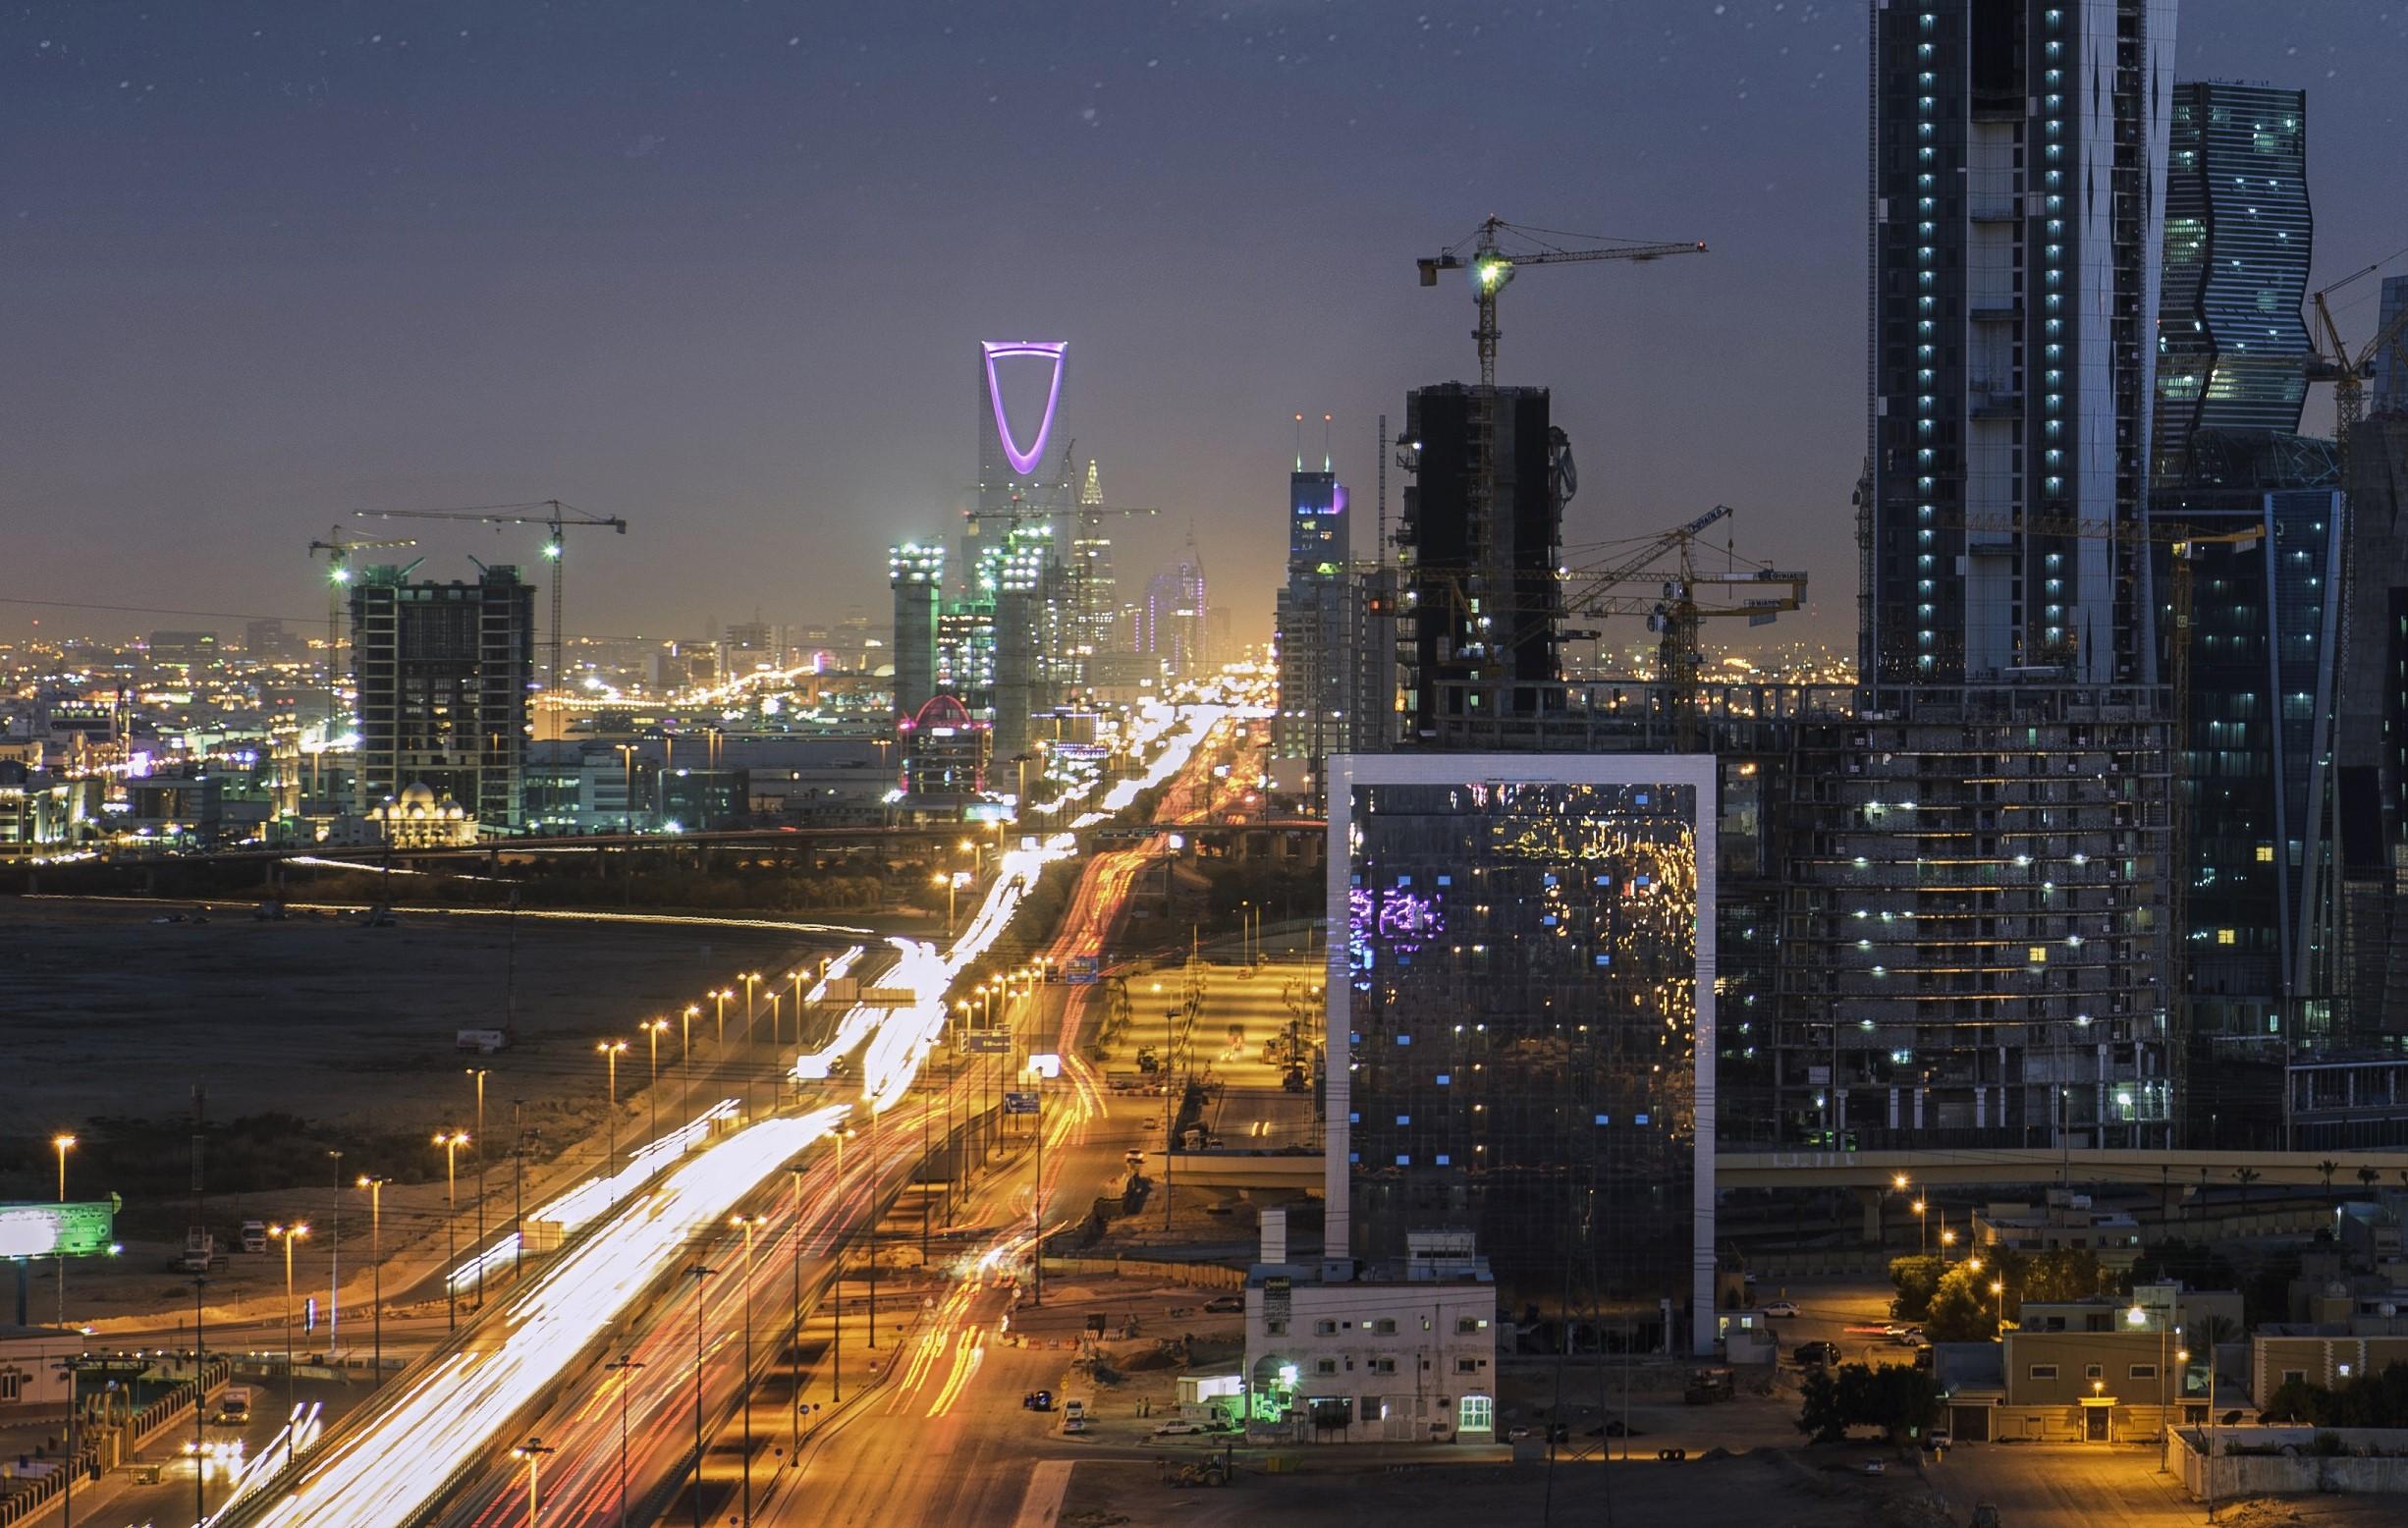 Saudi Arabia strives to be top regional business hub